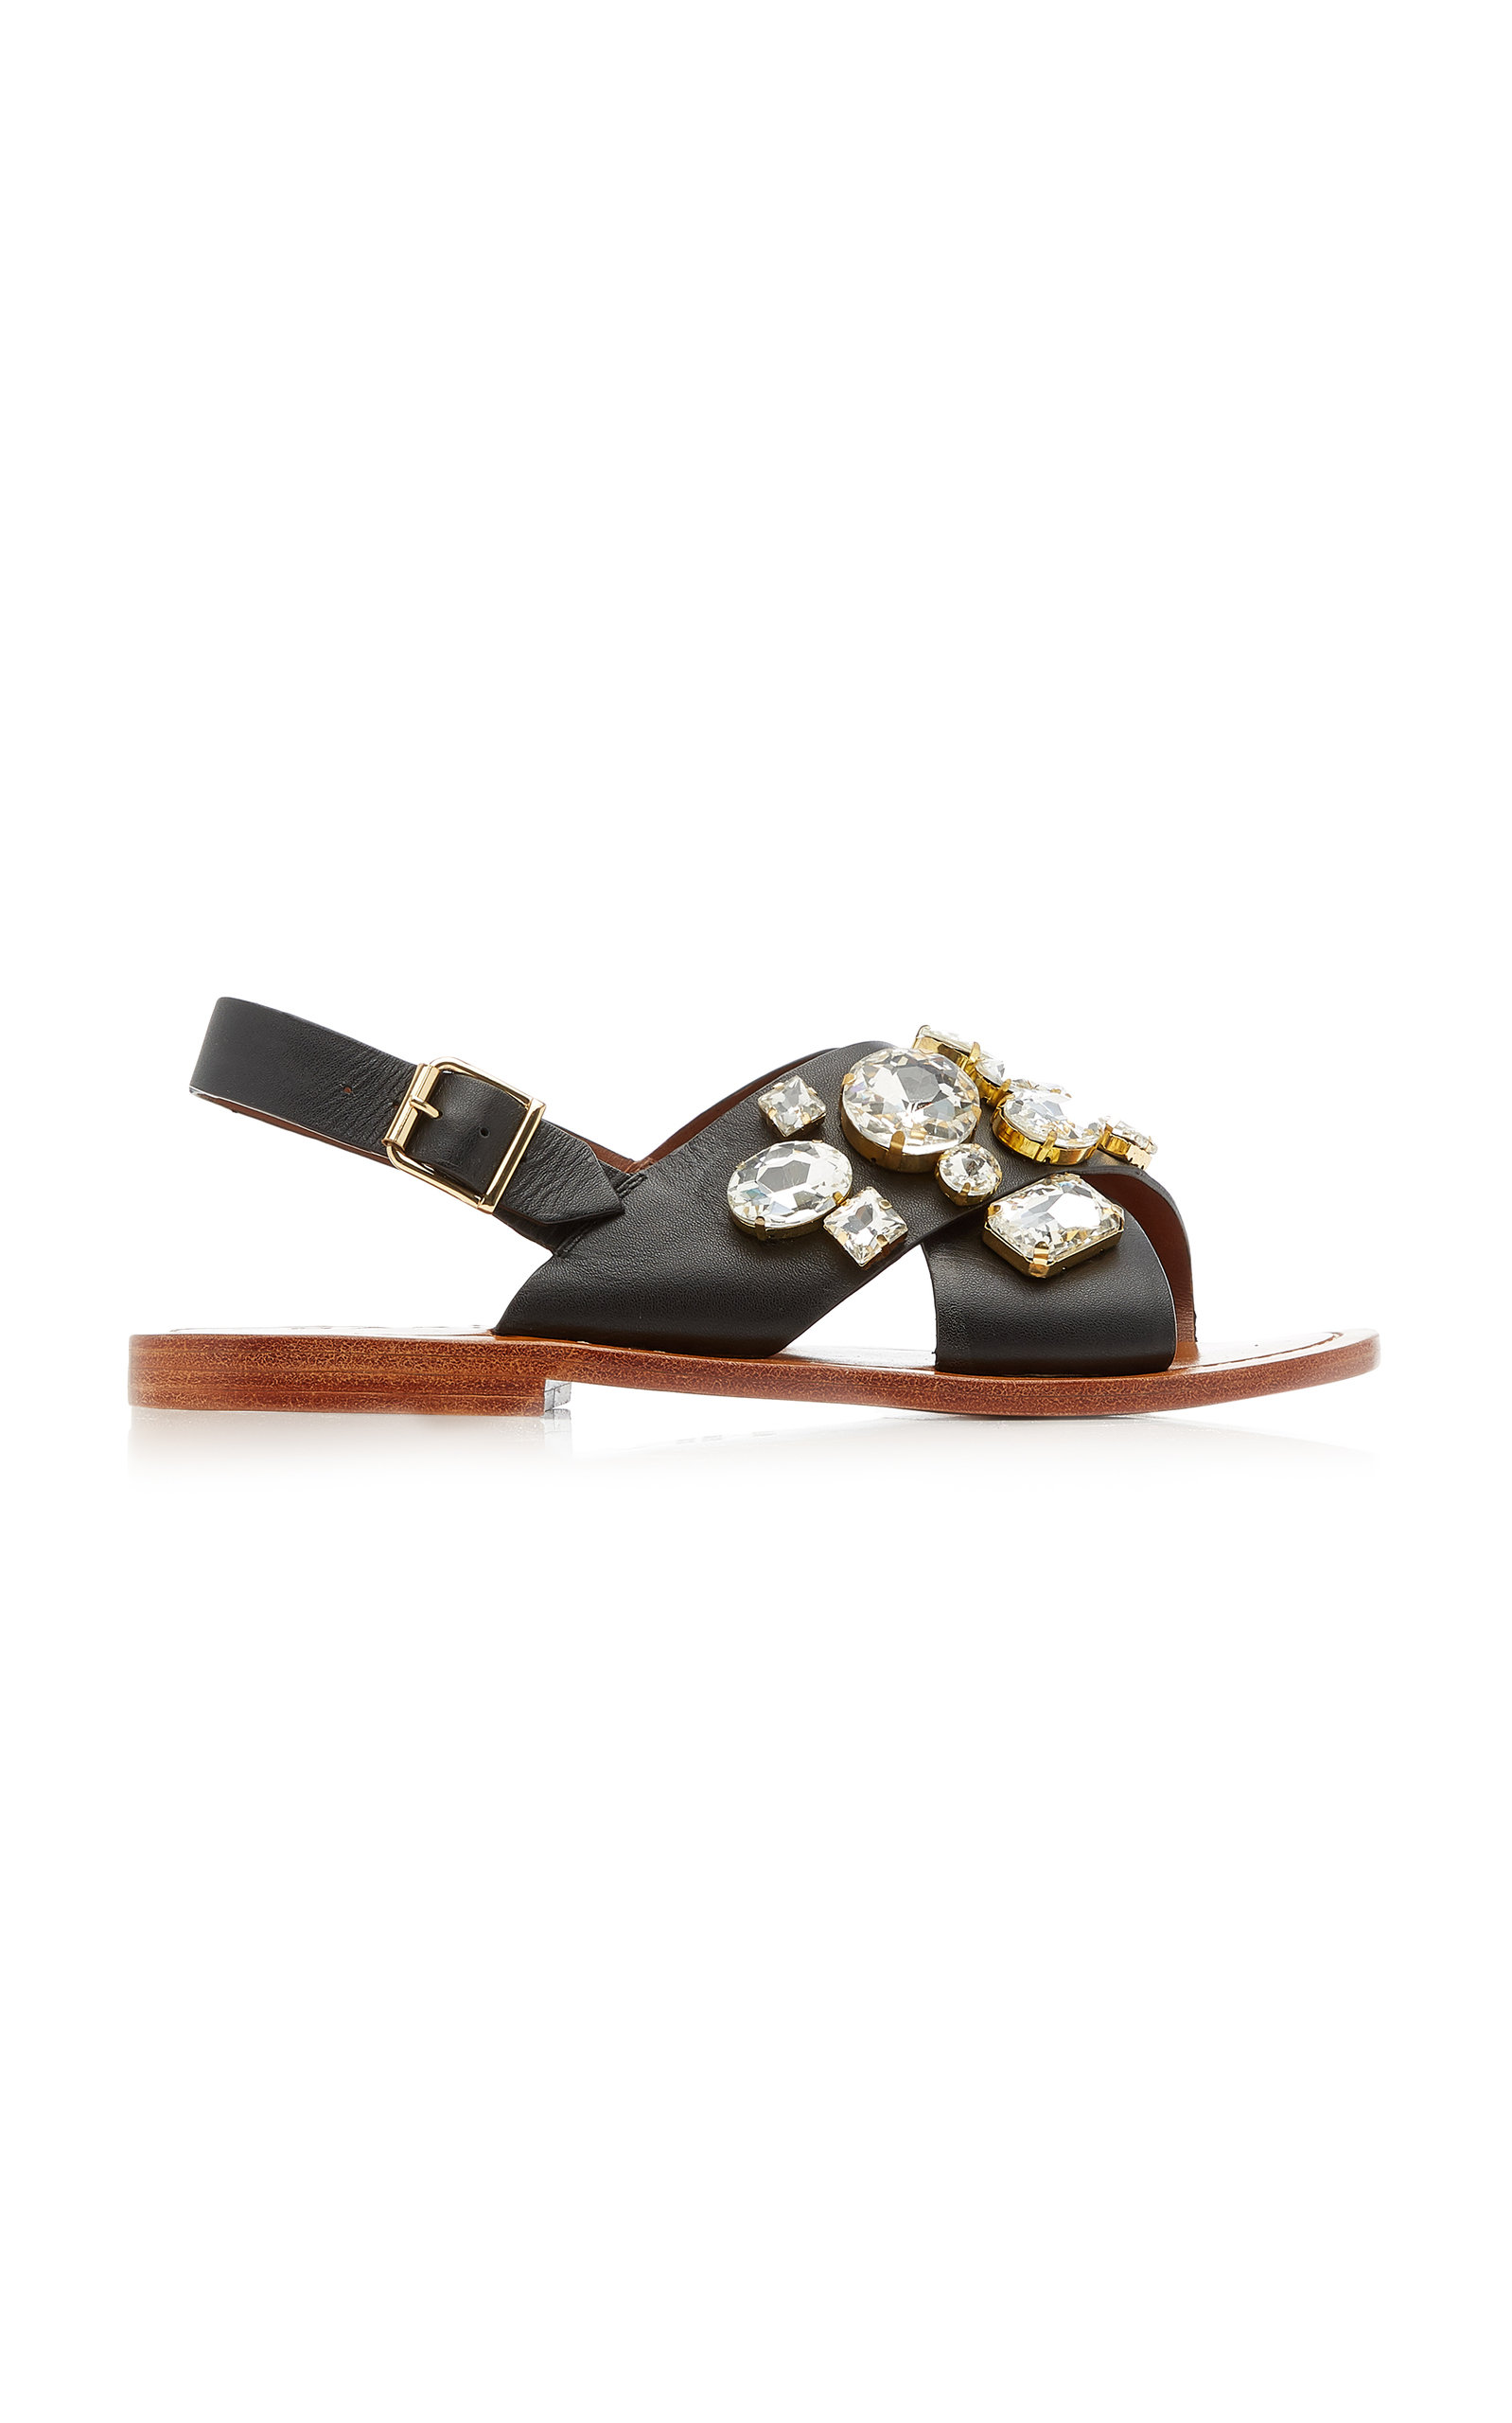 Marni Sandals WOMEN'S CRYSTAL-EMBELLISHED LEATHER SANDALS